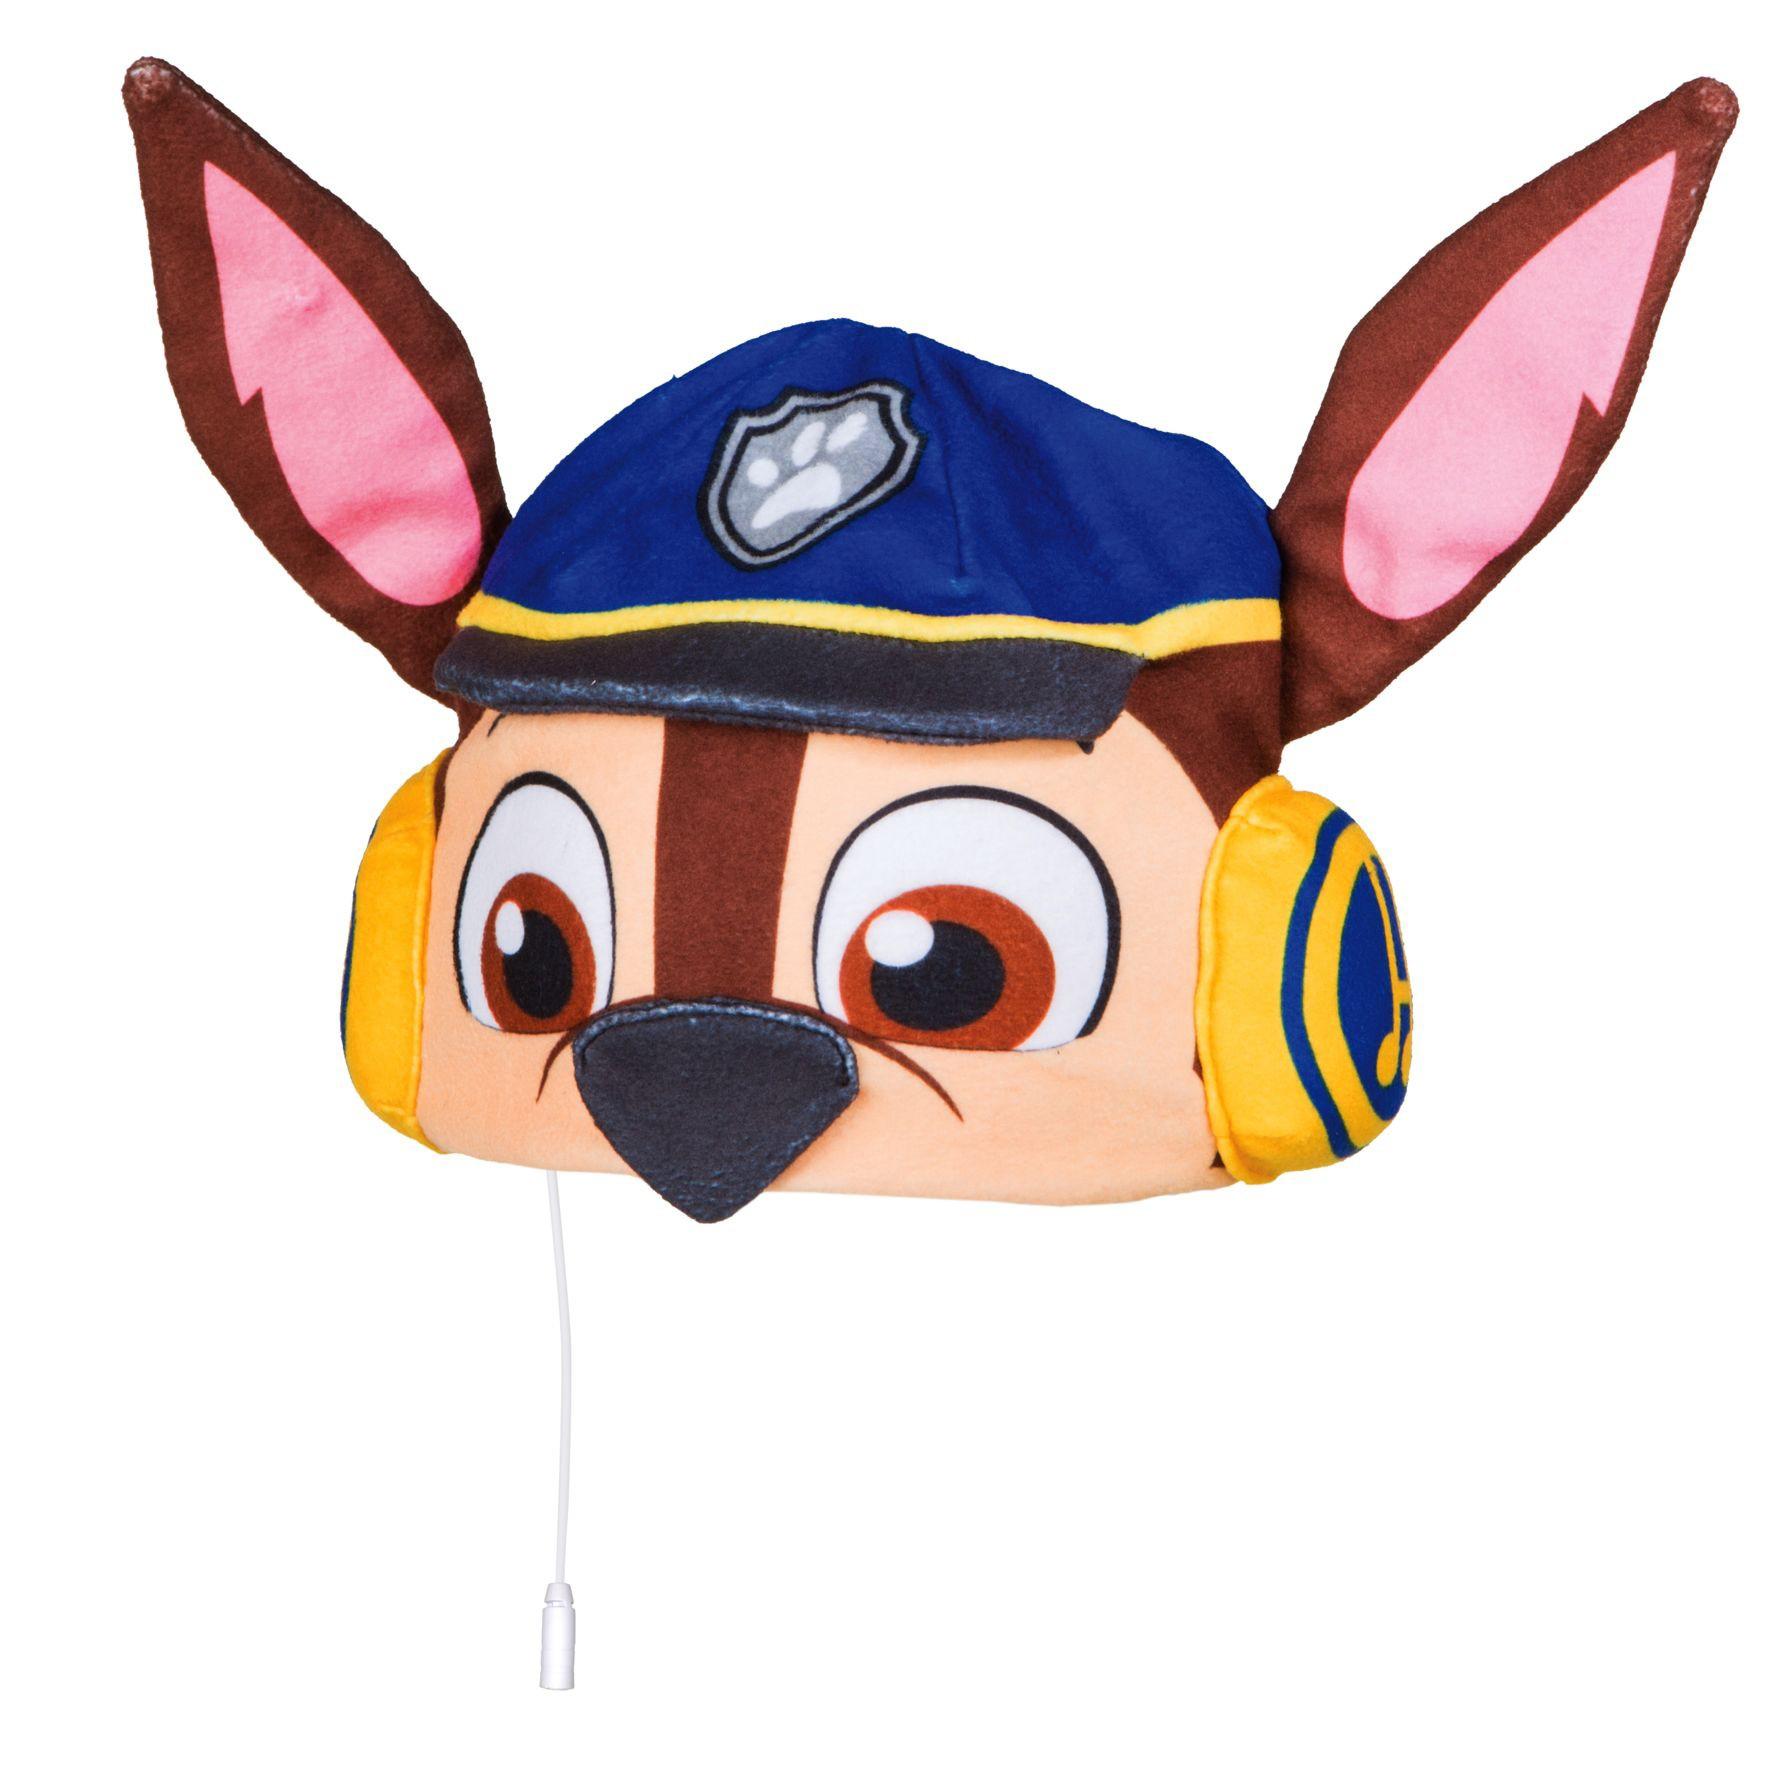 Paw Patrol Chase høretelefoner